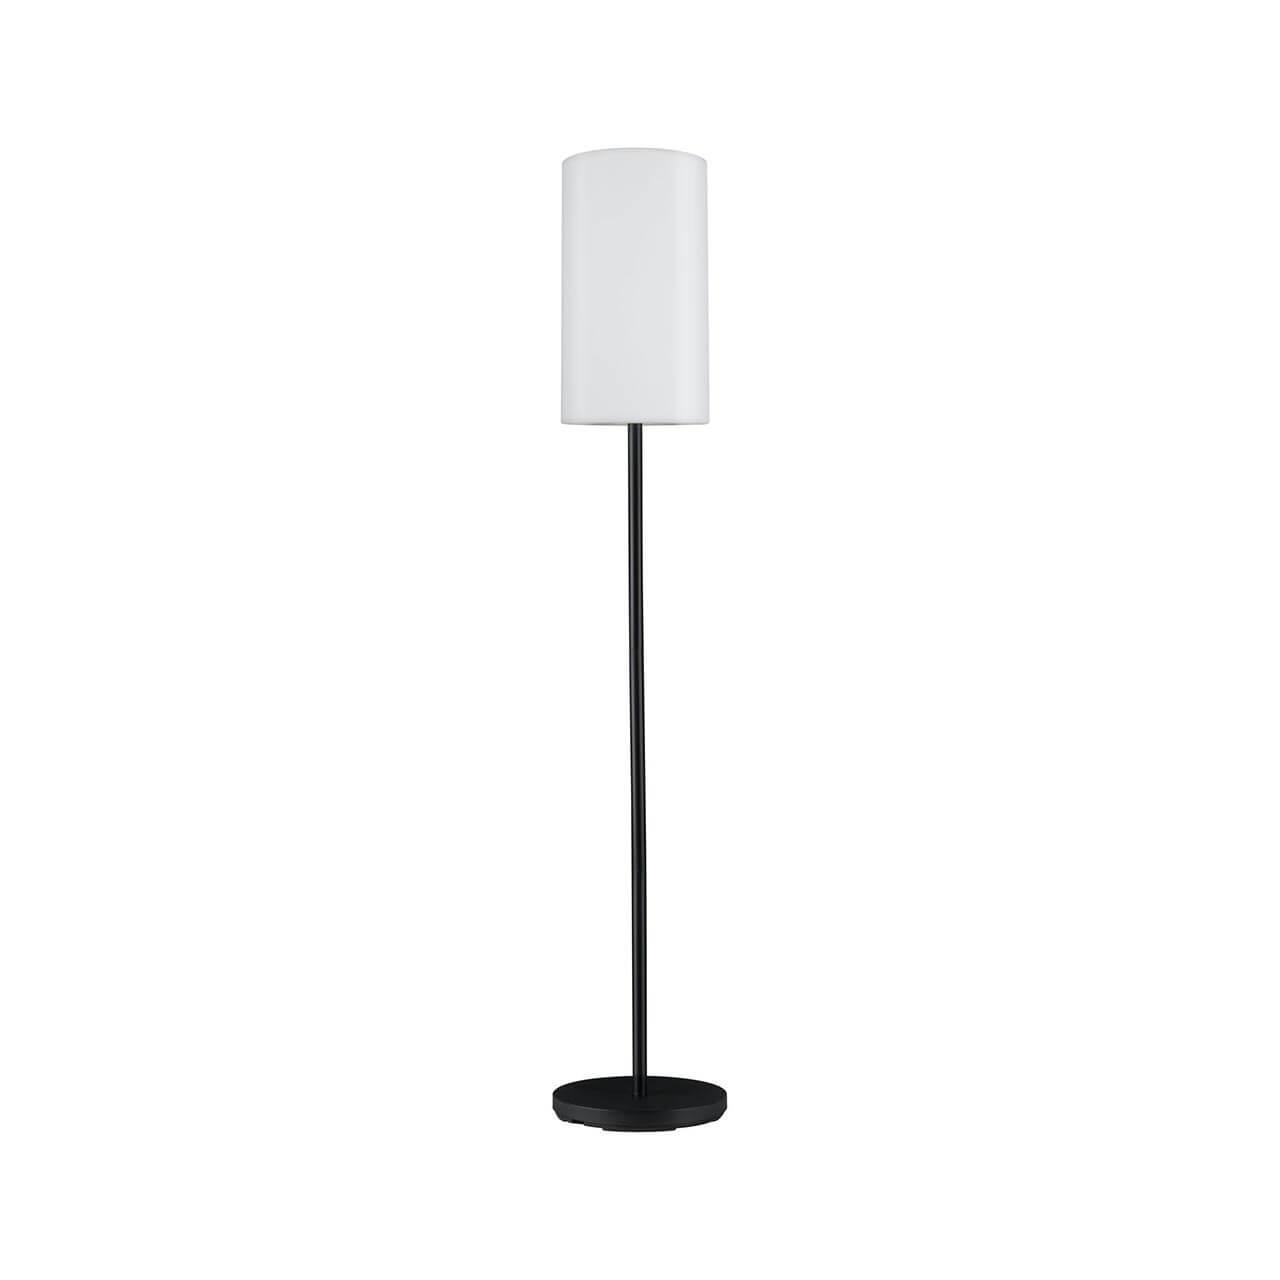 Светильник Paulmann 94220 Mobile Pipe